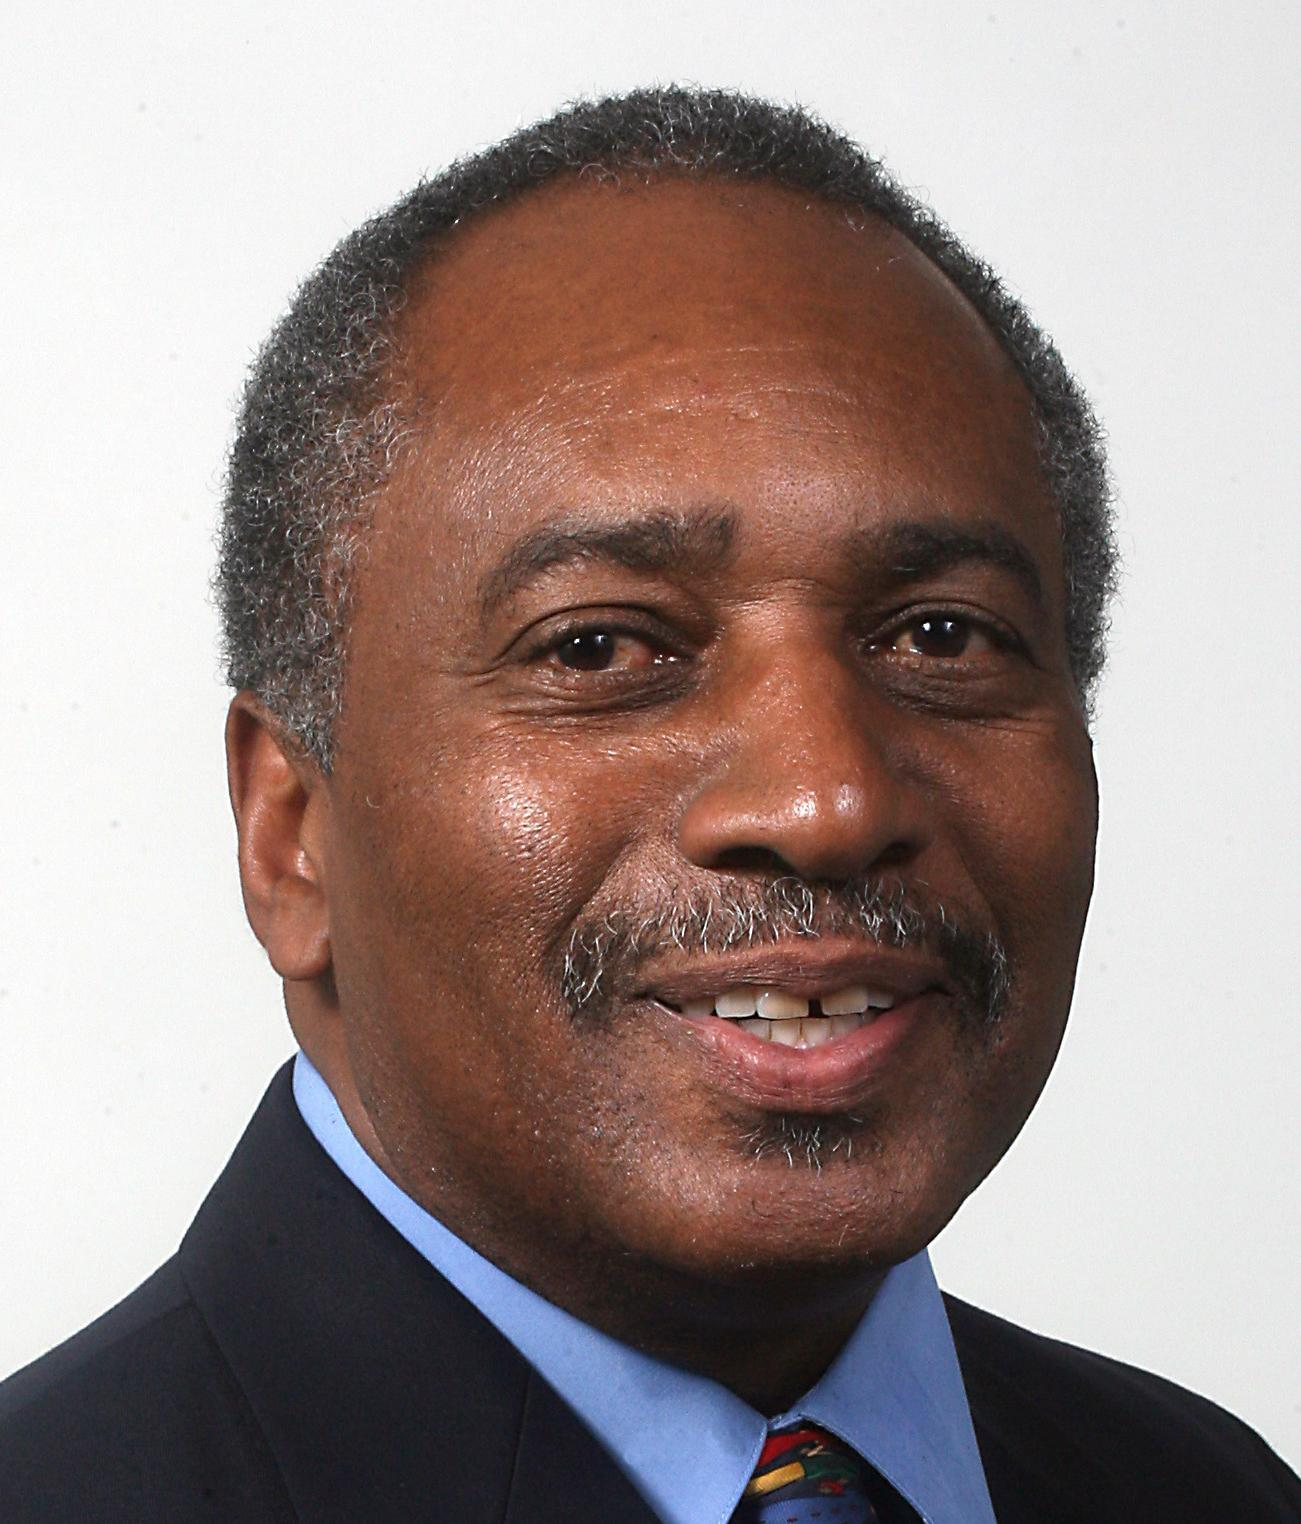 Retired, award-winning journalist Dwight Lewis